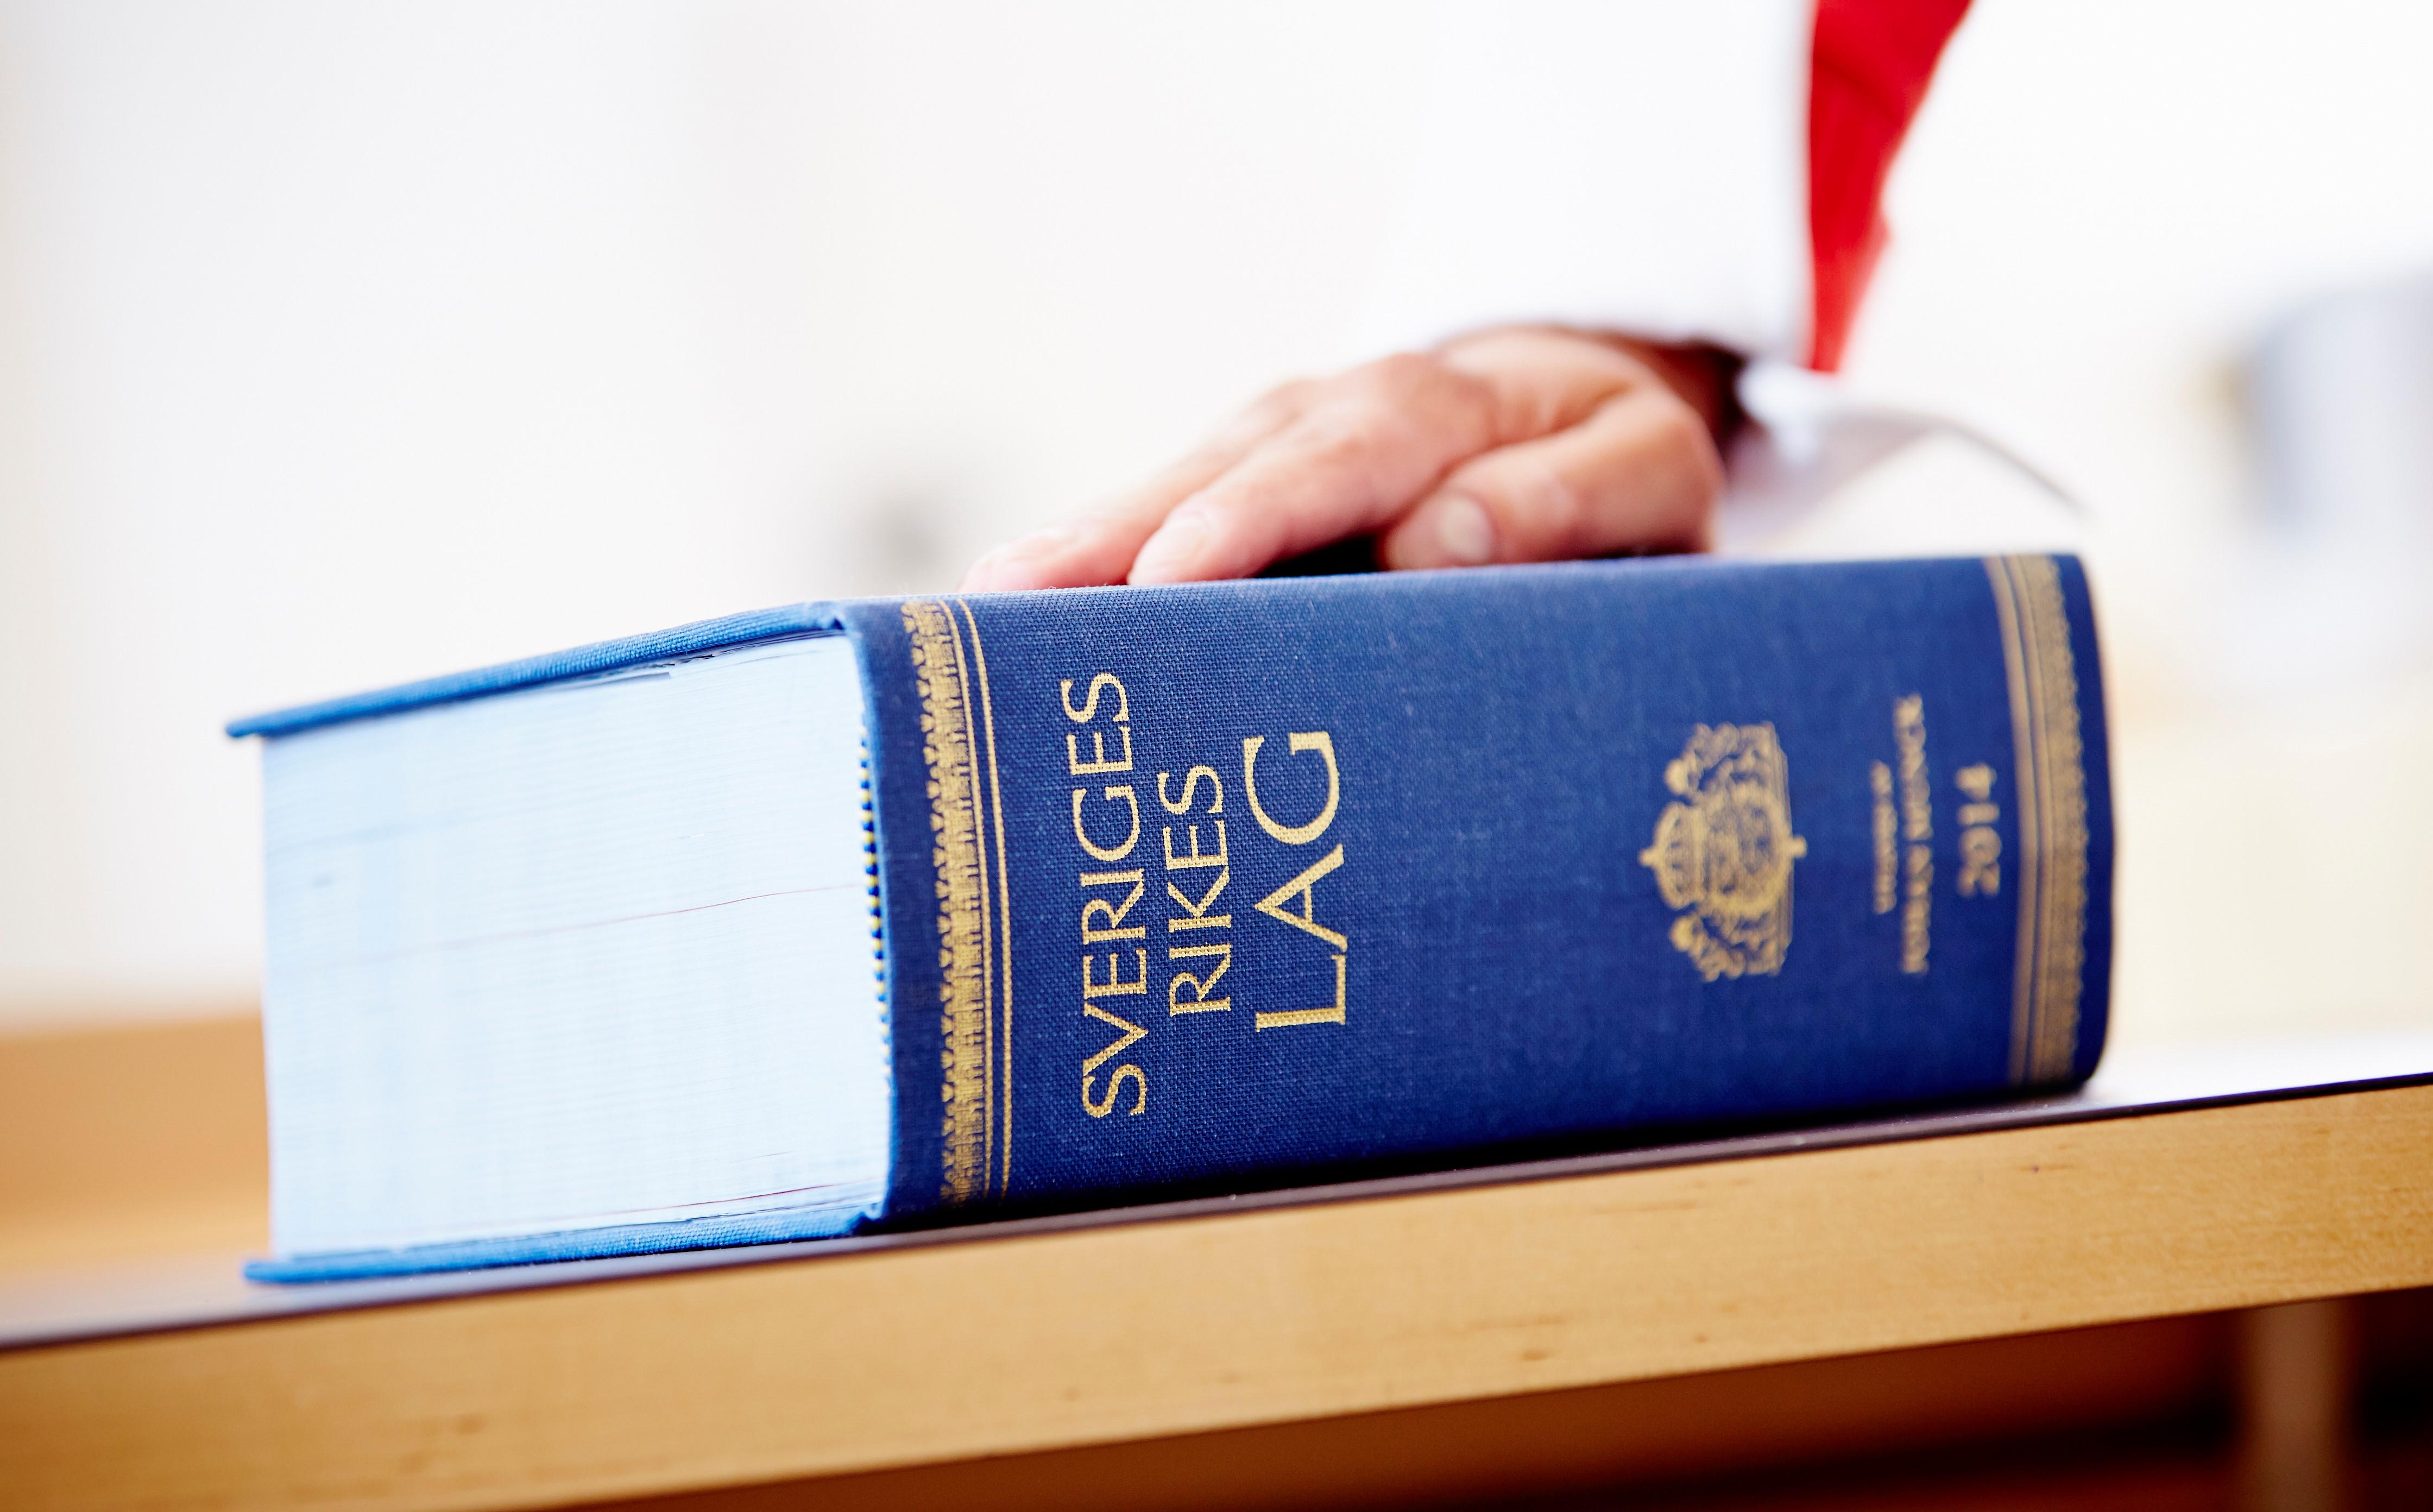 Anbud365: Krevet solide bevis fra klageren bak påstand om unormalt lave tilbud